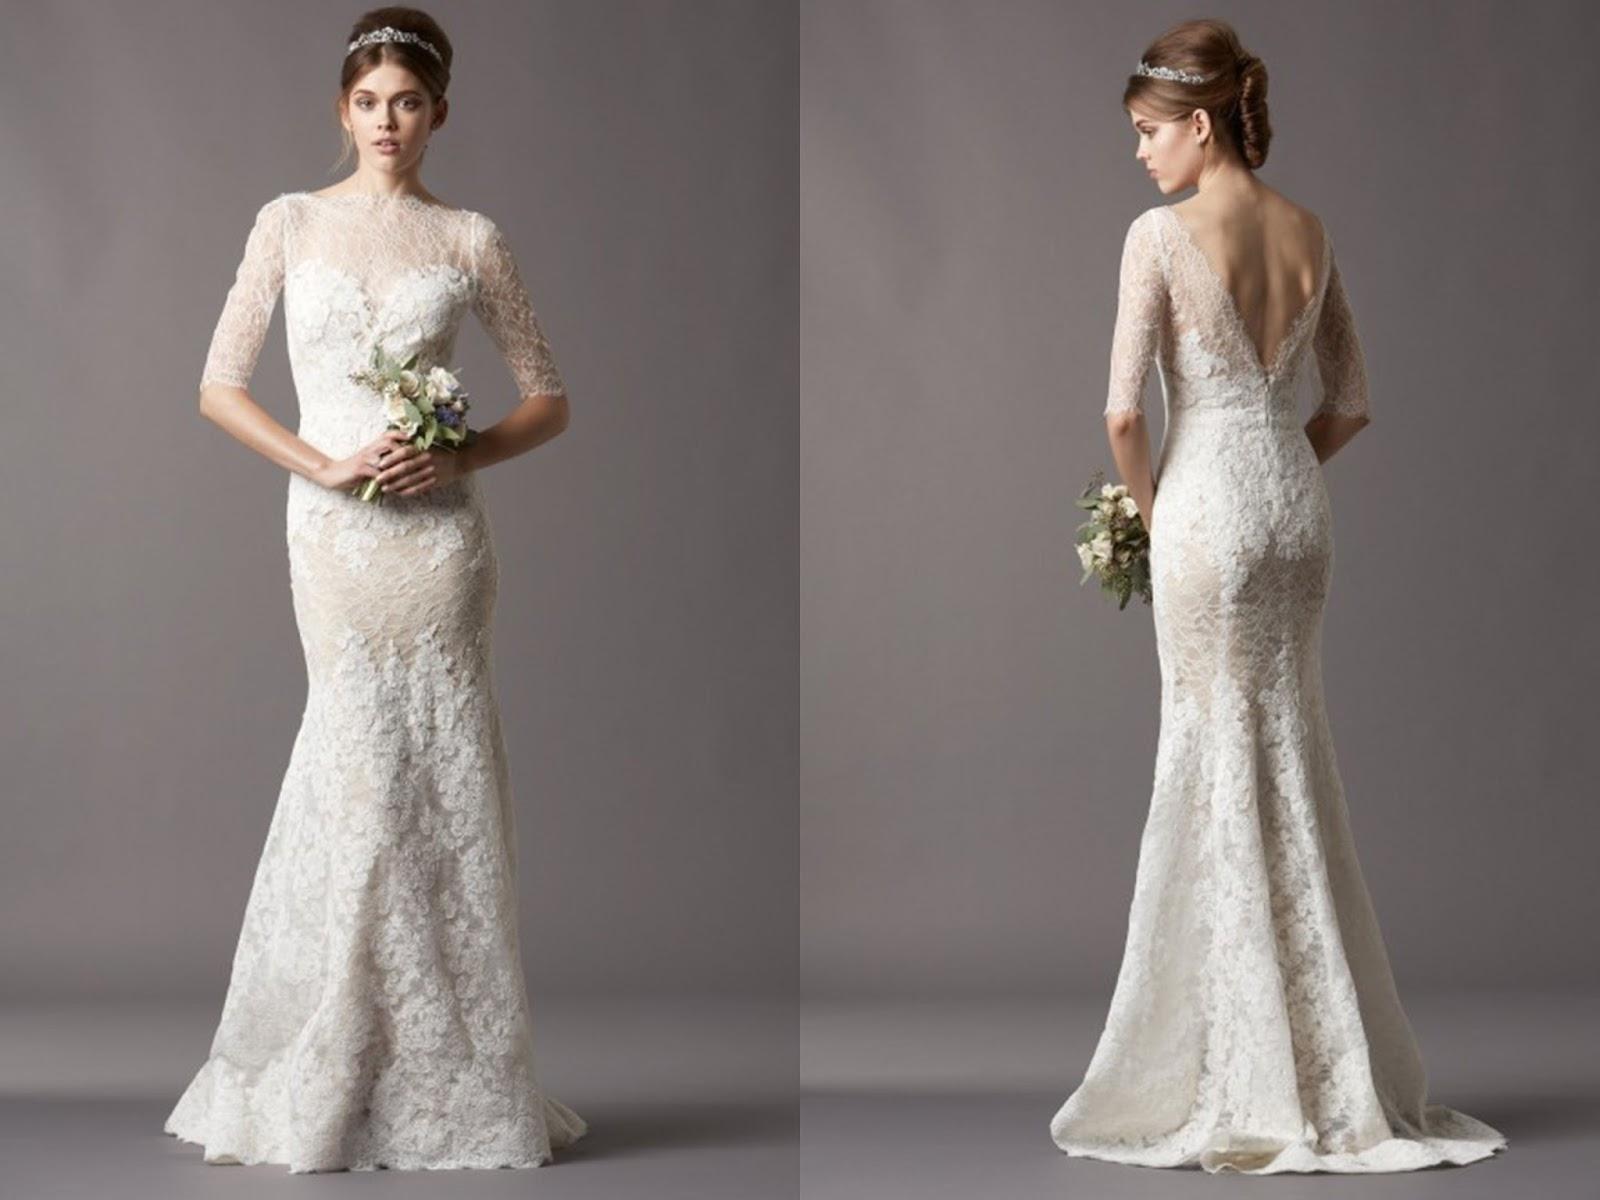 Landybridal Cheap Beautiful Wedding Dress Luch Luch Craft